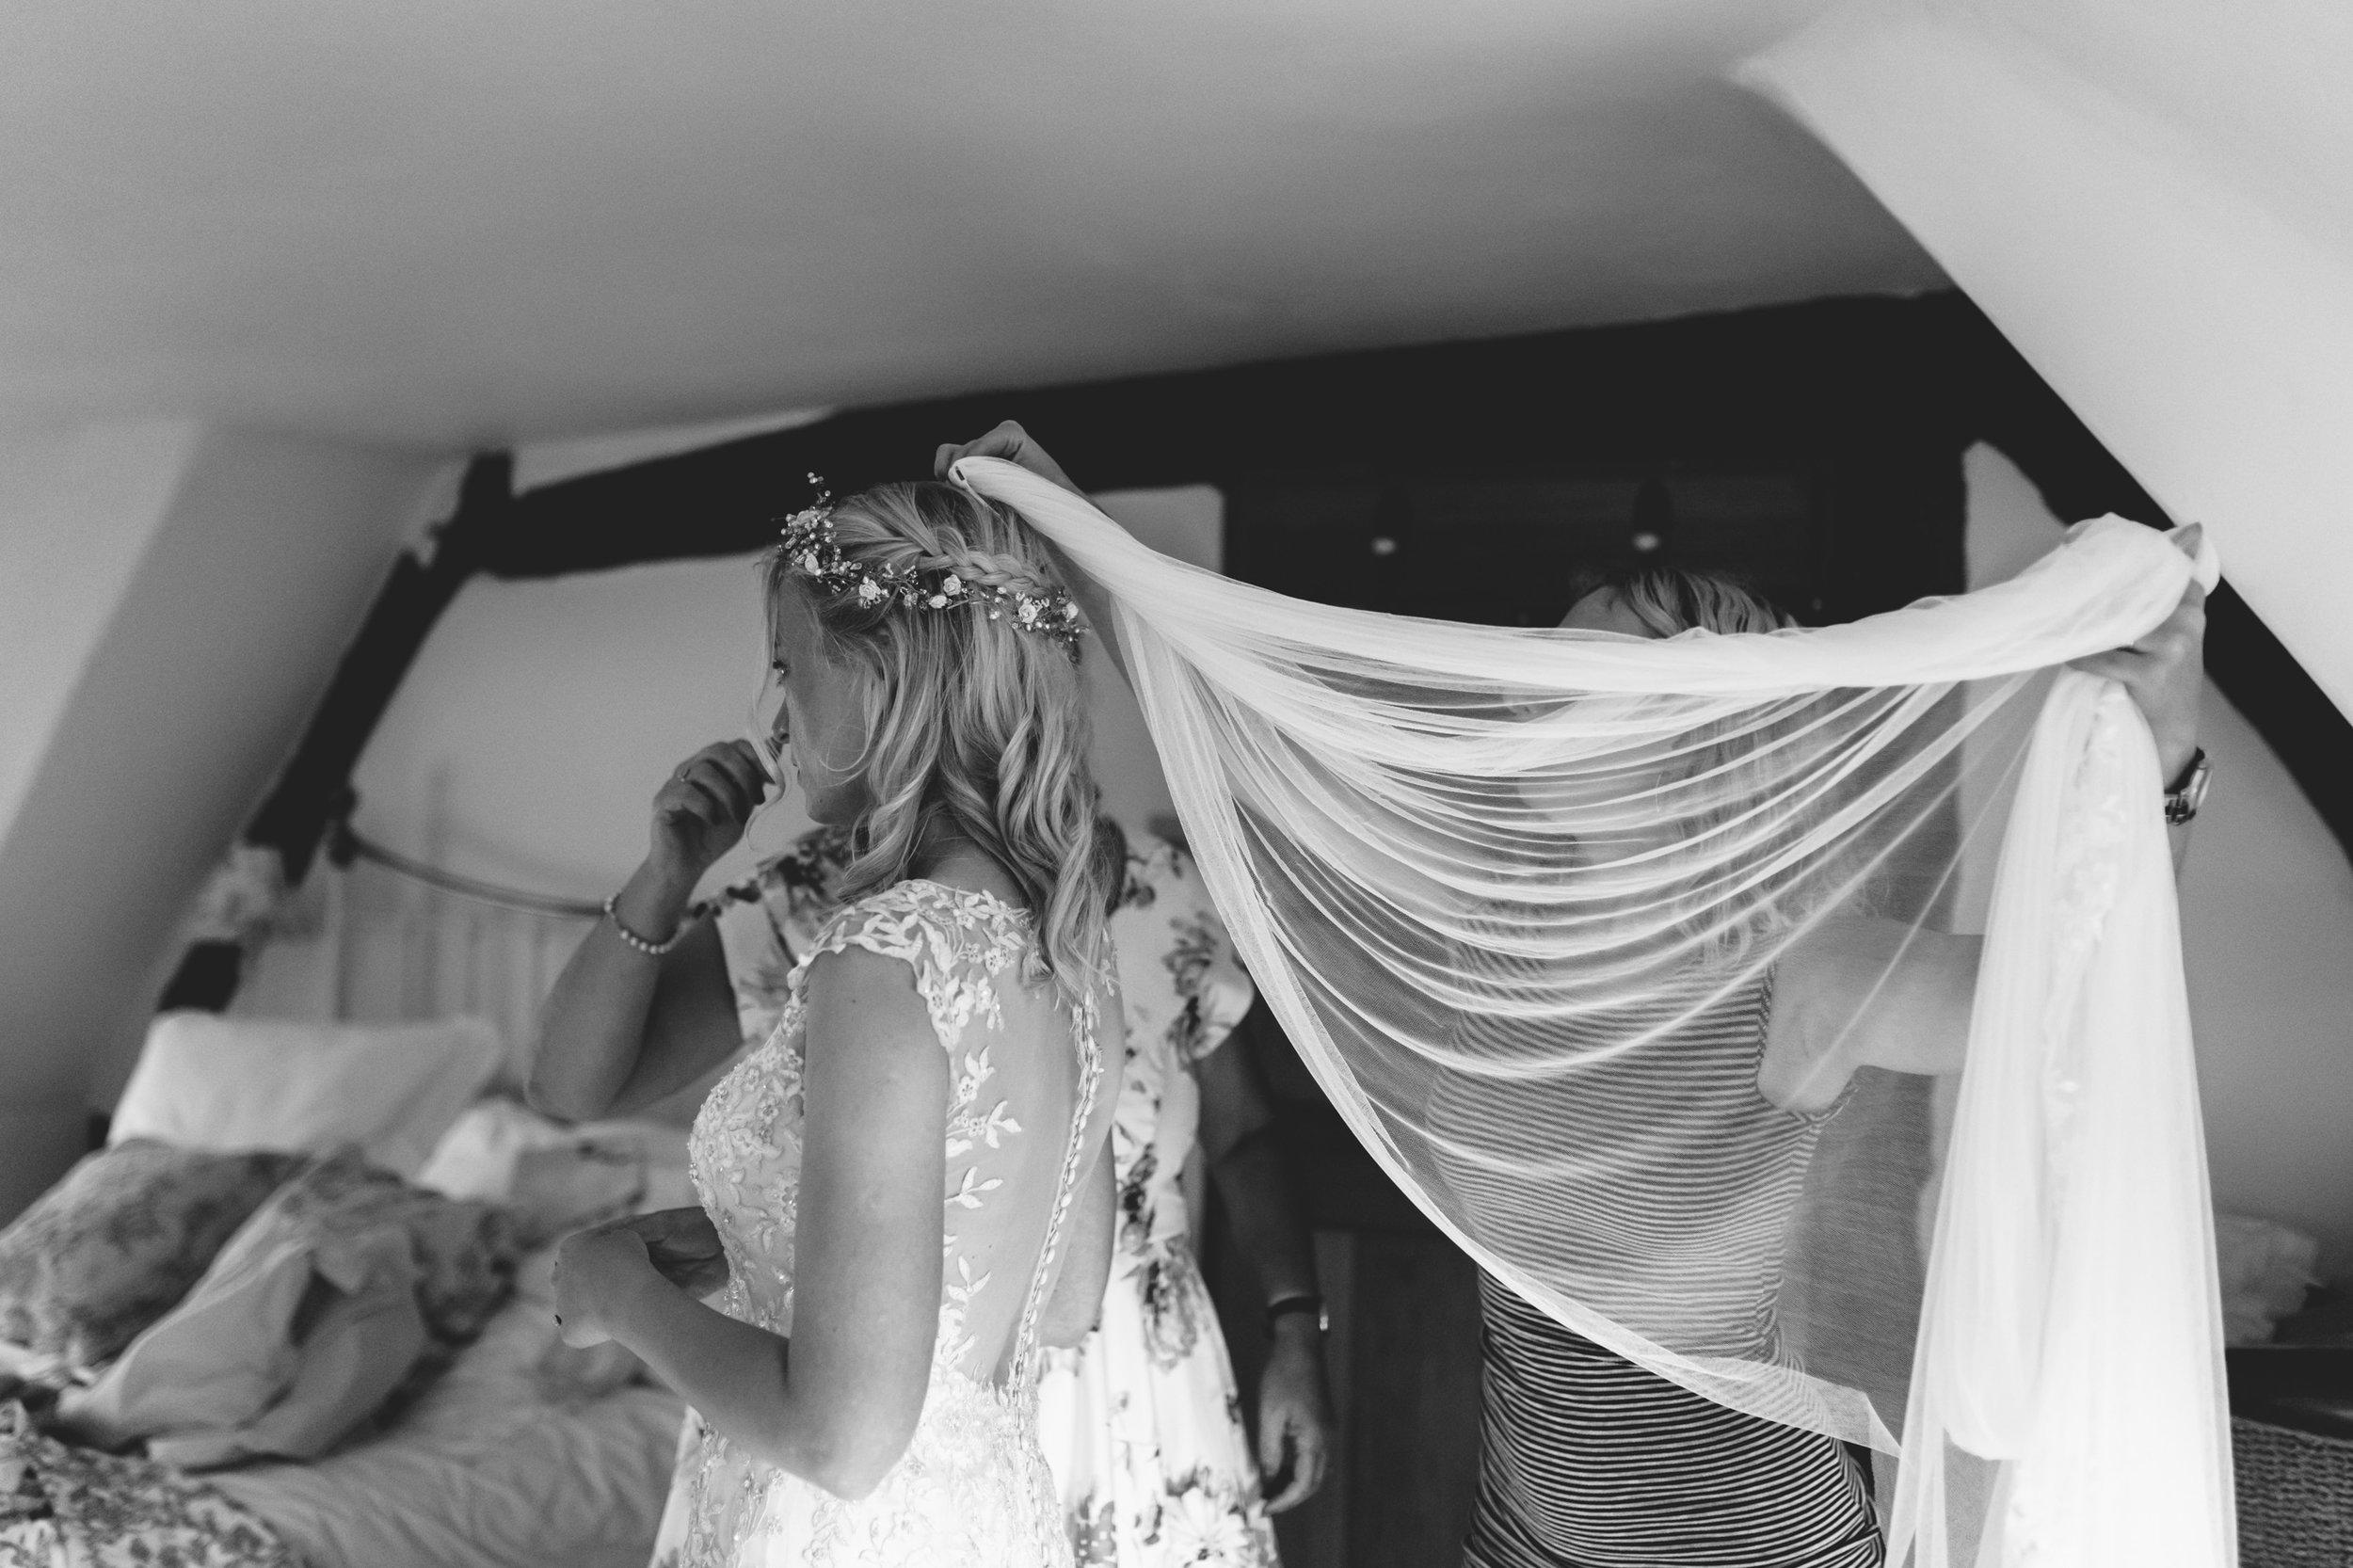 wedding dress Birmingham photographer wedding country artistic wedding photography98.jpg